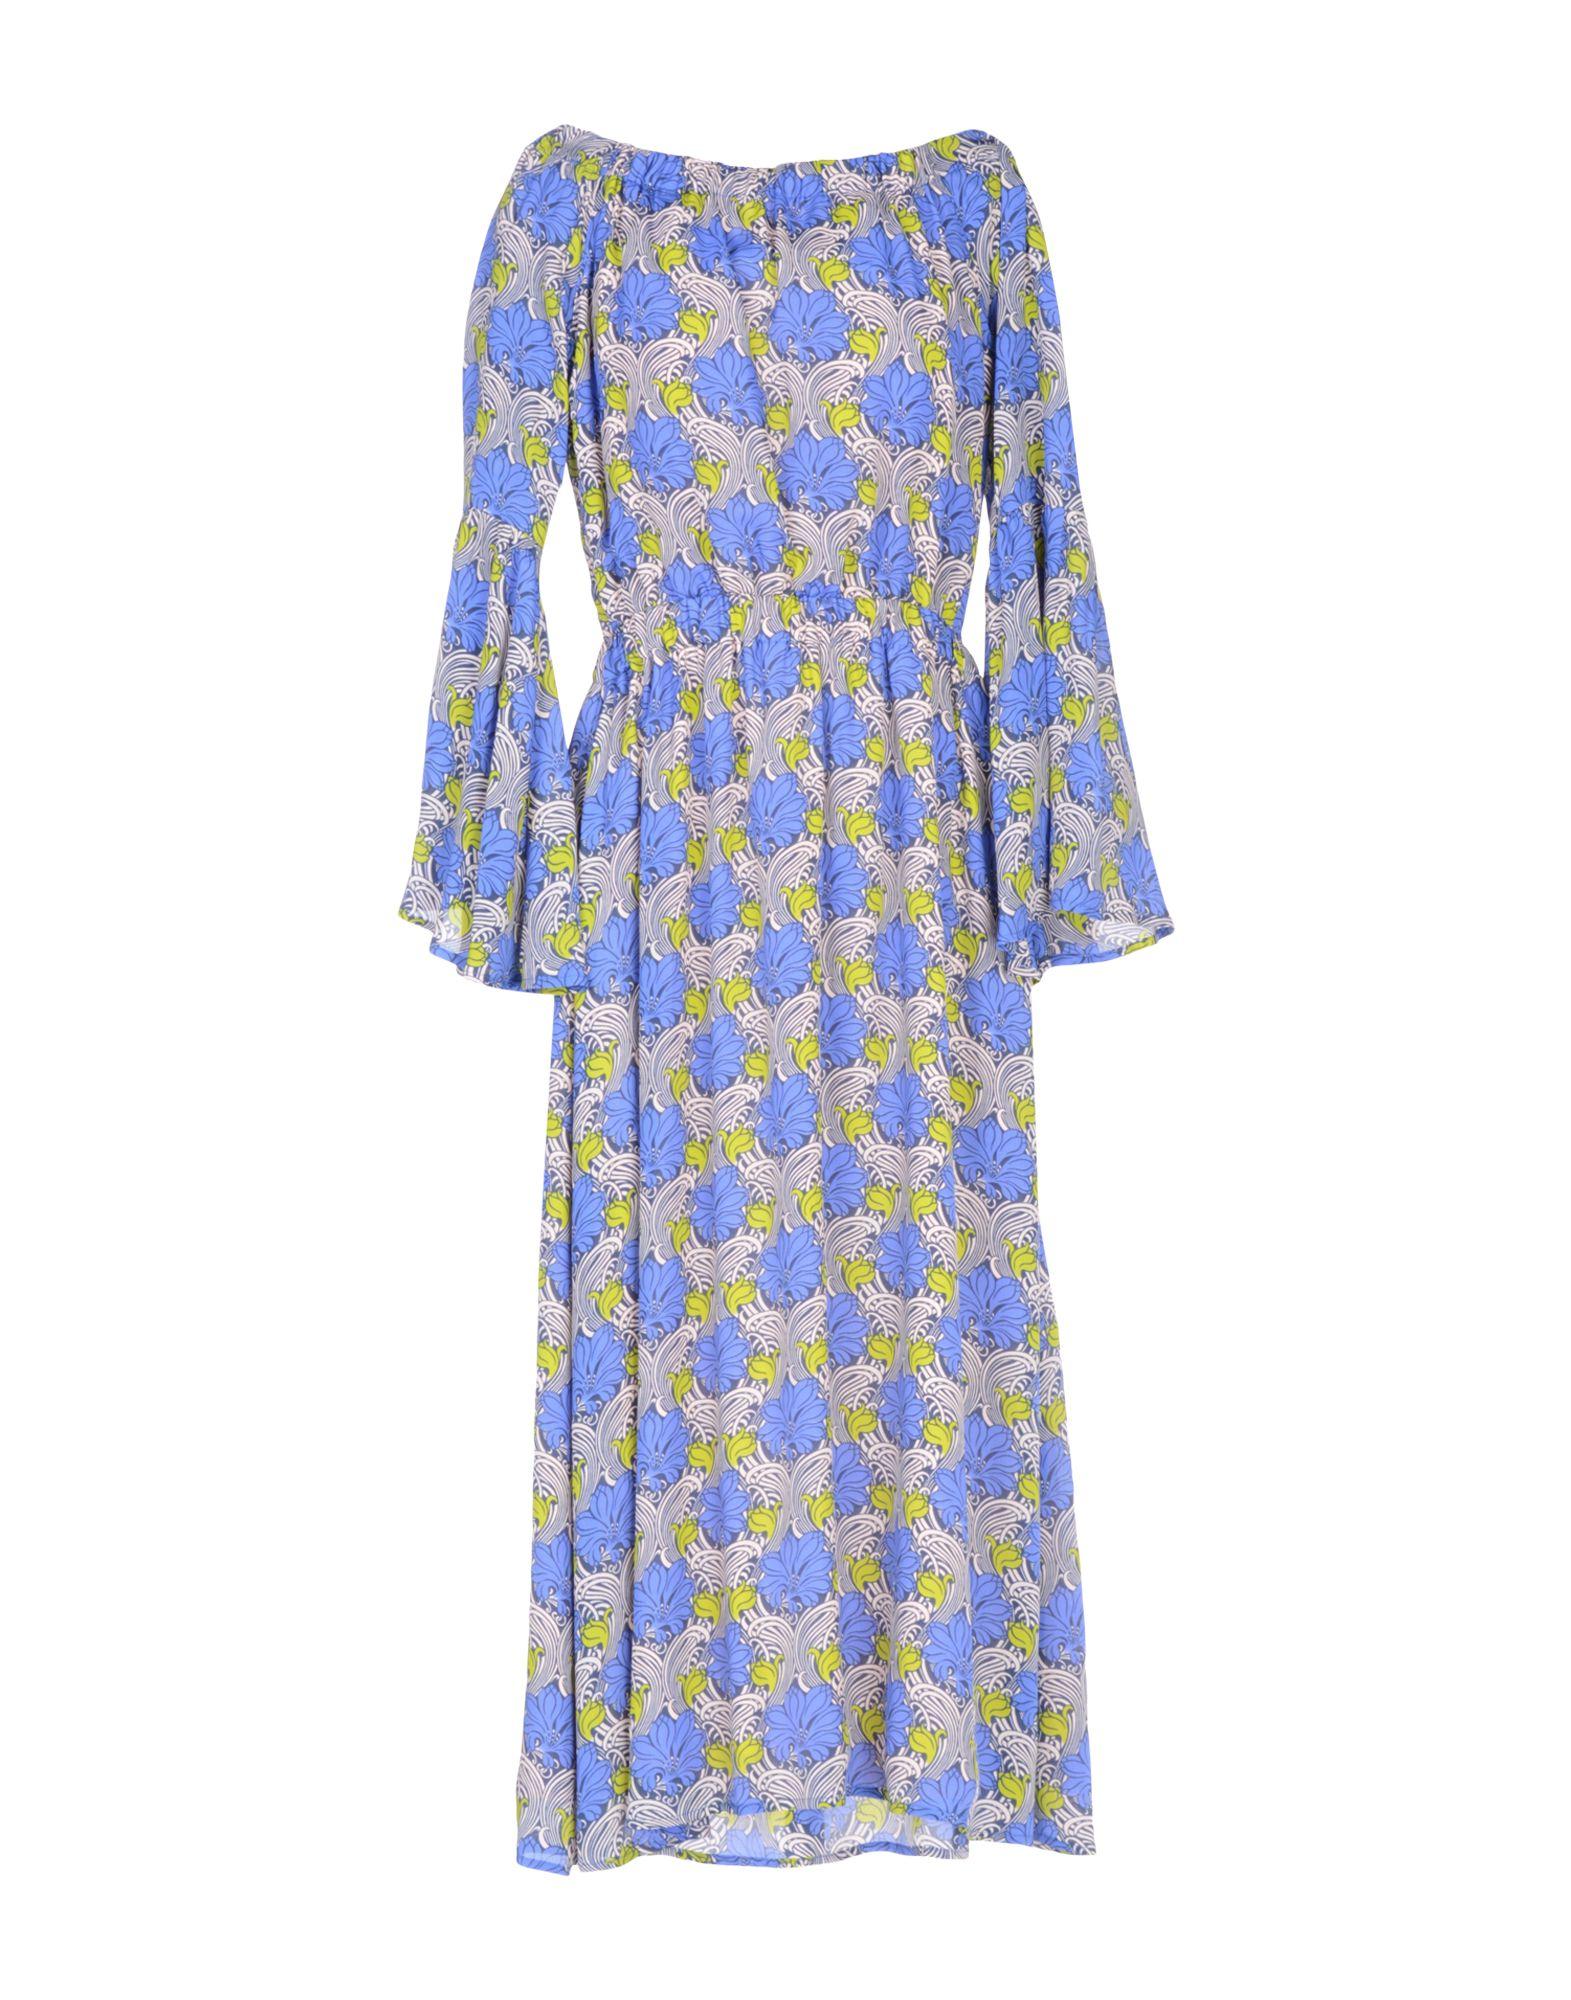 ATOS LOMBARDINI Платье длиной 3/4 atos atos lombardini юбка длиной 3 4